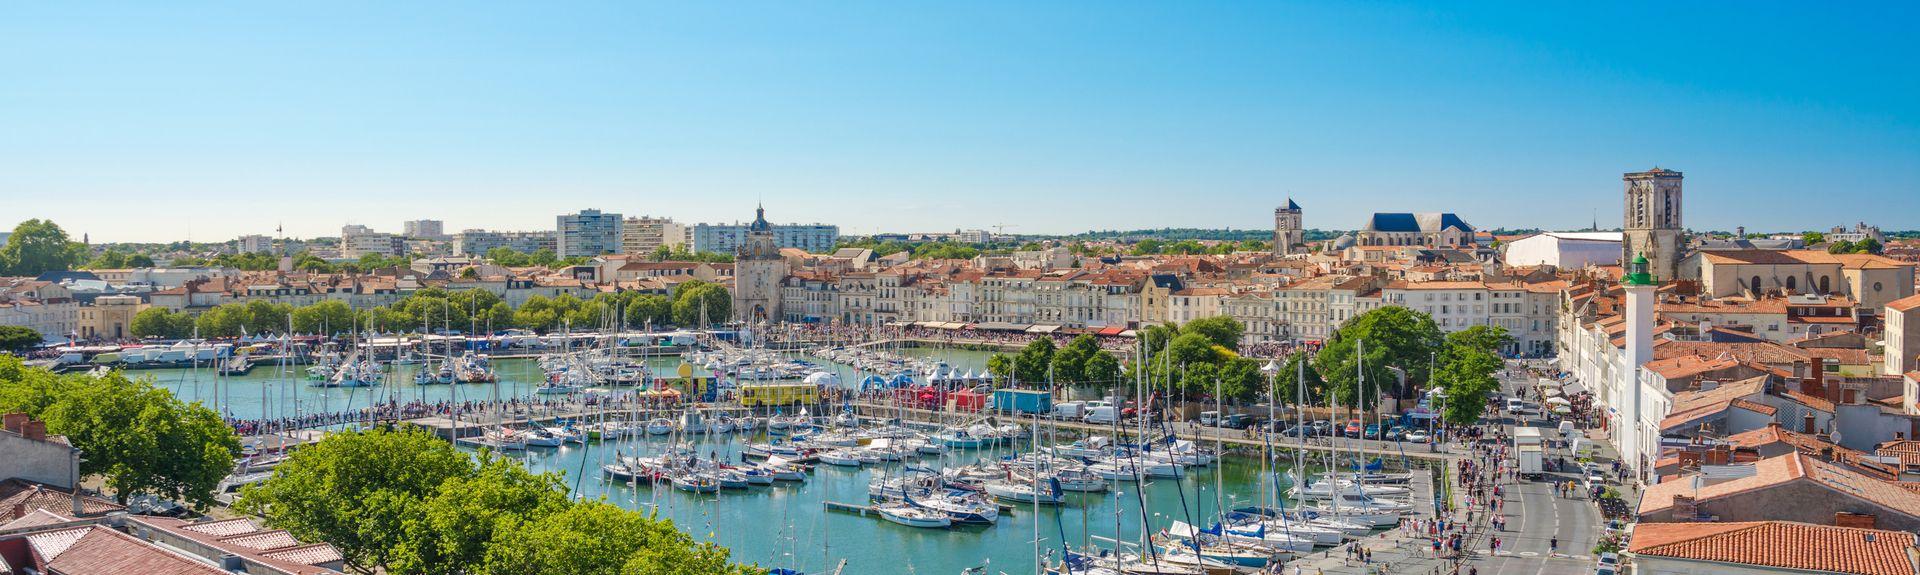 Main image ofOne week in La Rochelle and its surroundings